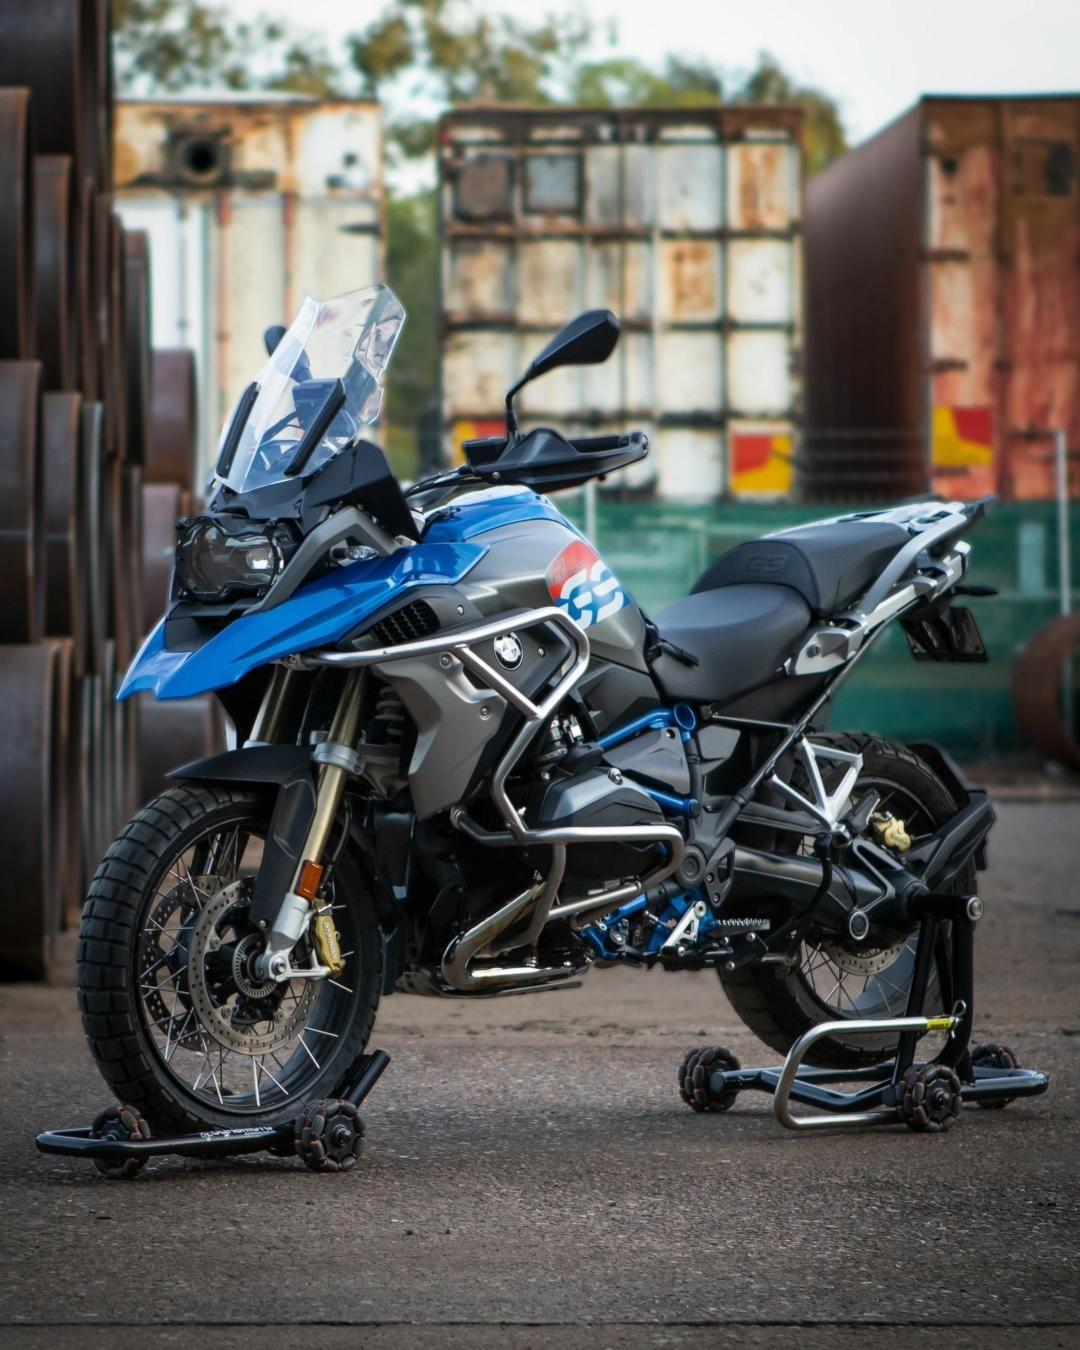 Go Multi Directional Bmw R1200gs Dynamoto Video In 2020 Adventure Bike Motorcycles Motorcycle Design Bmw [ 1350 x 1080 Pixel ]